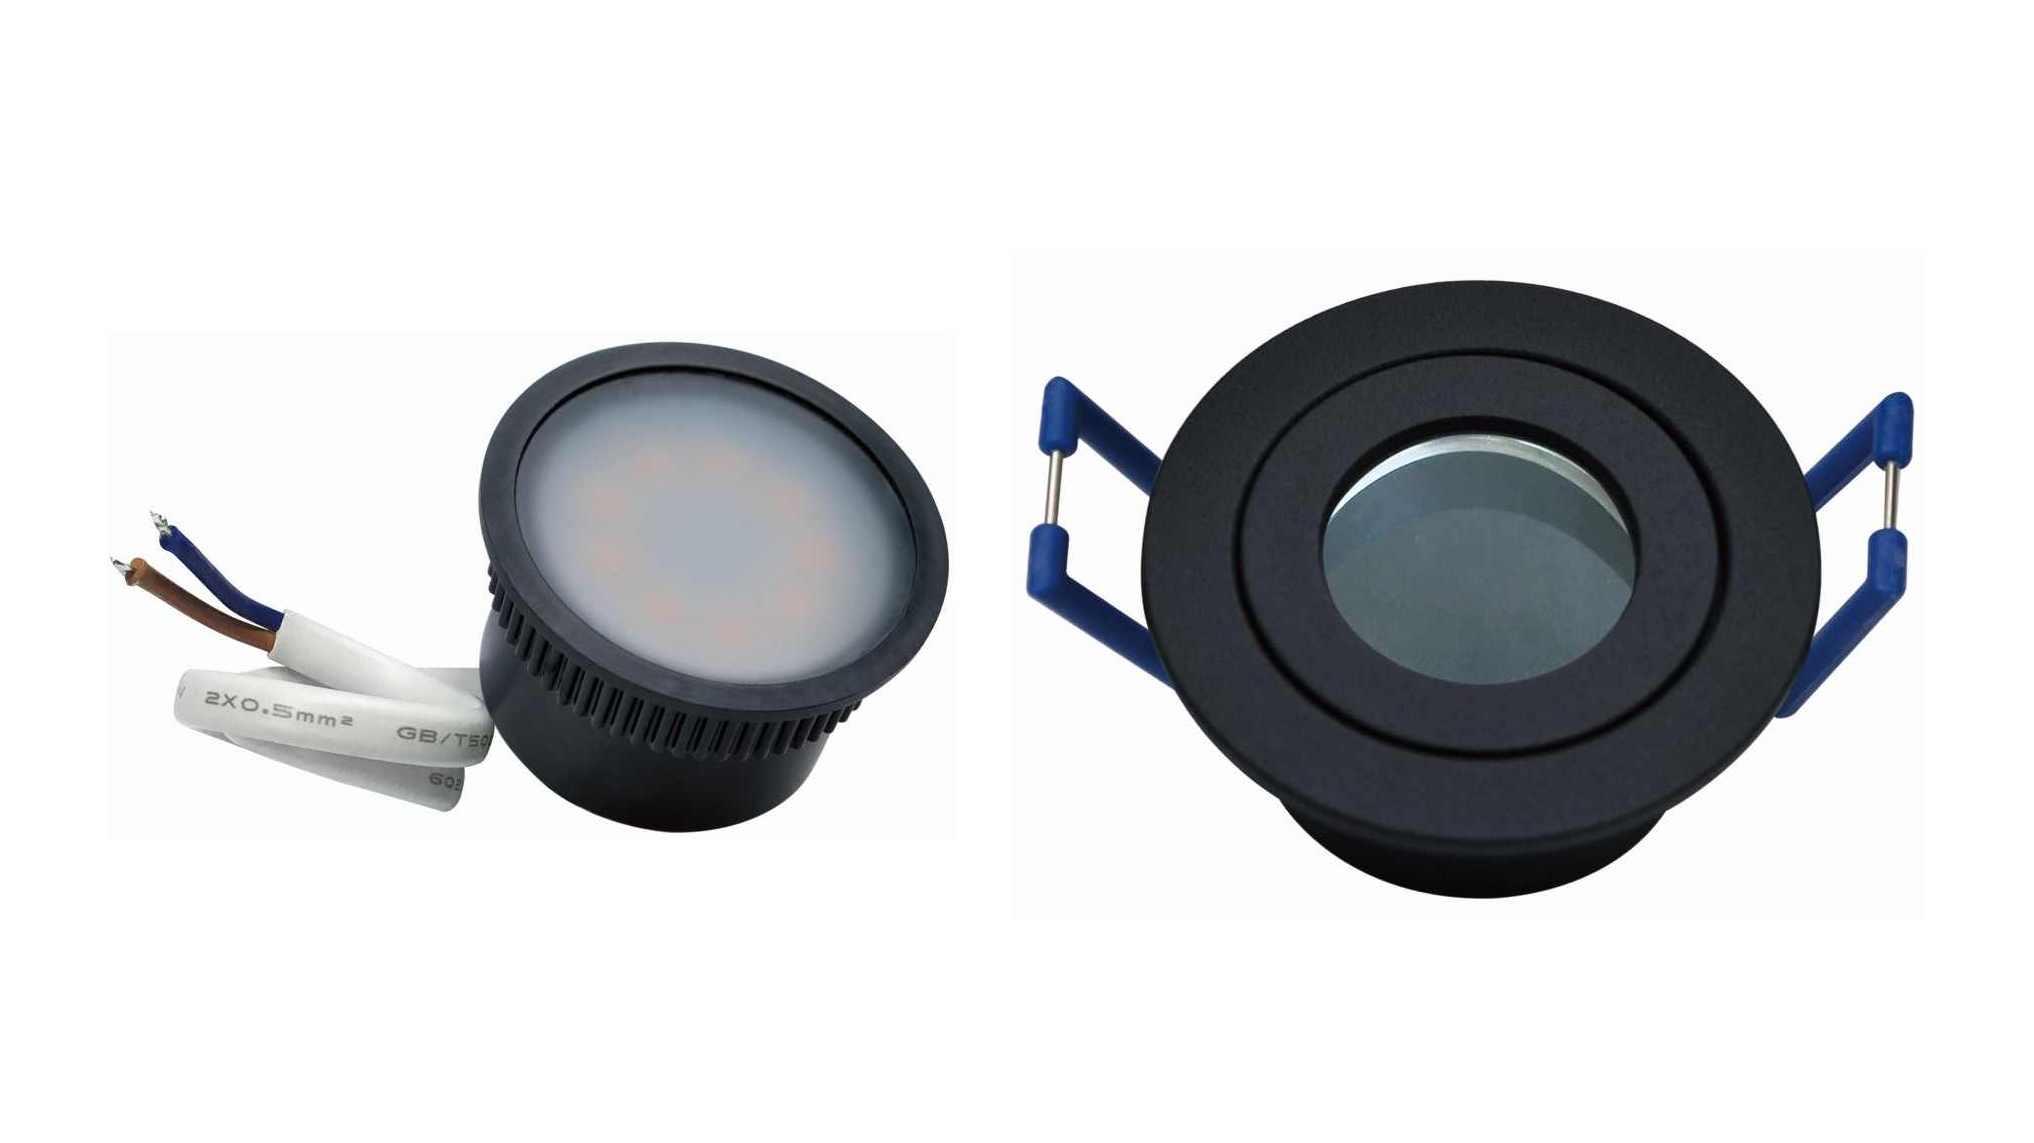 35mm Led Feuchtraum Spot